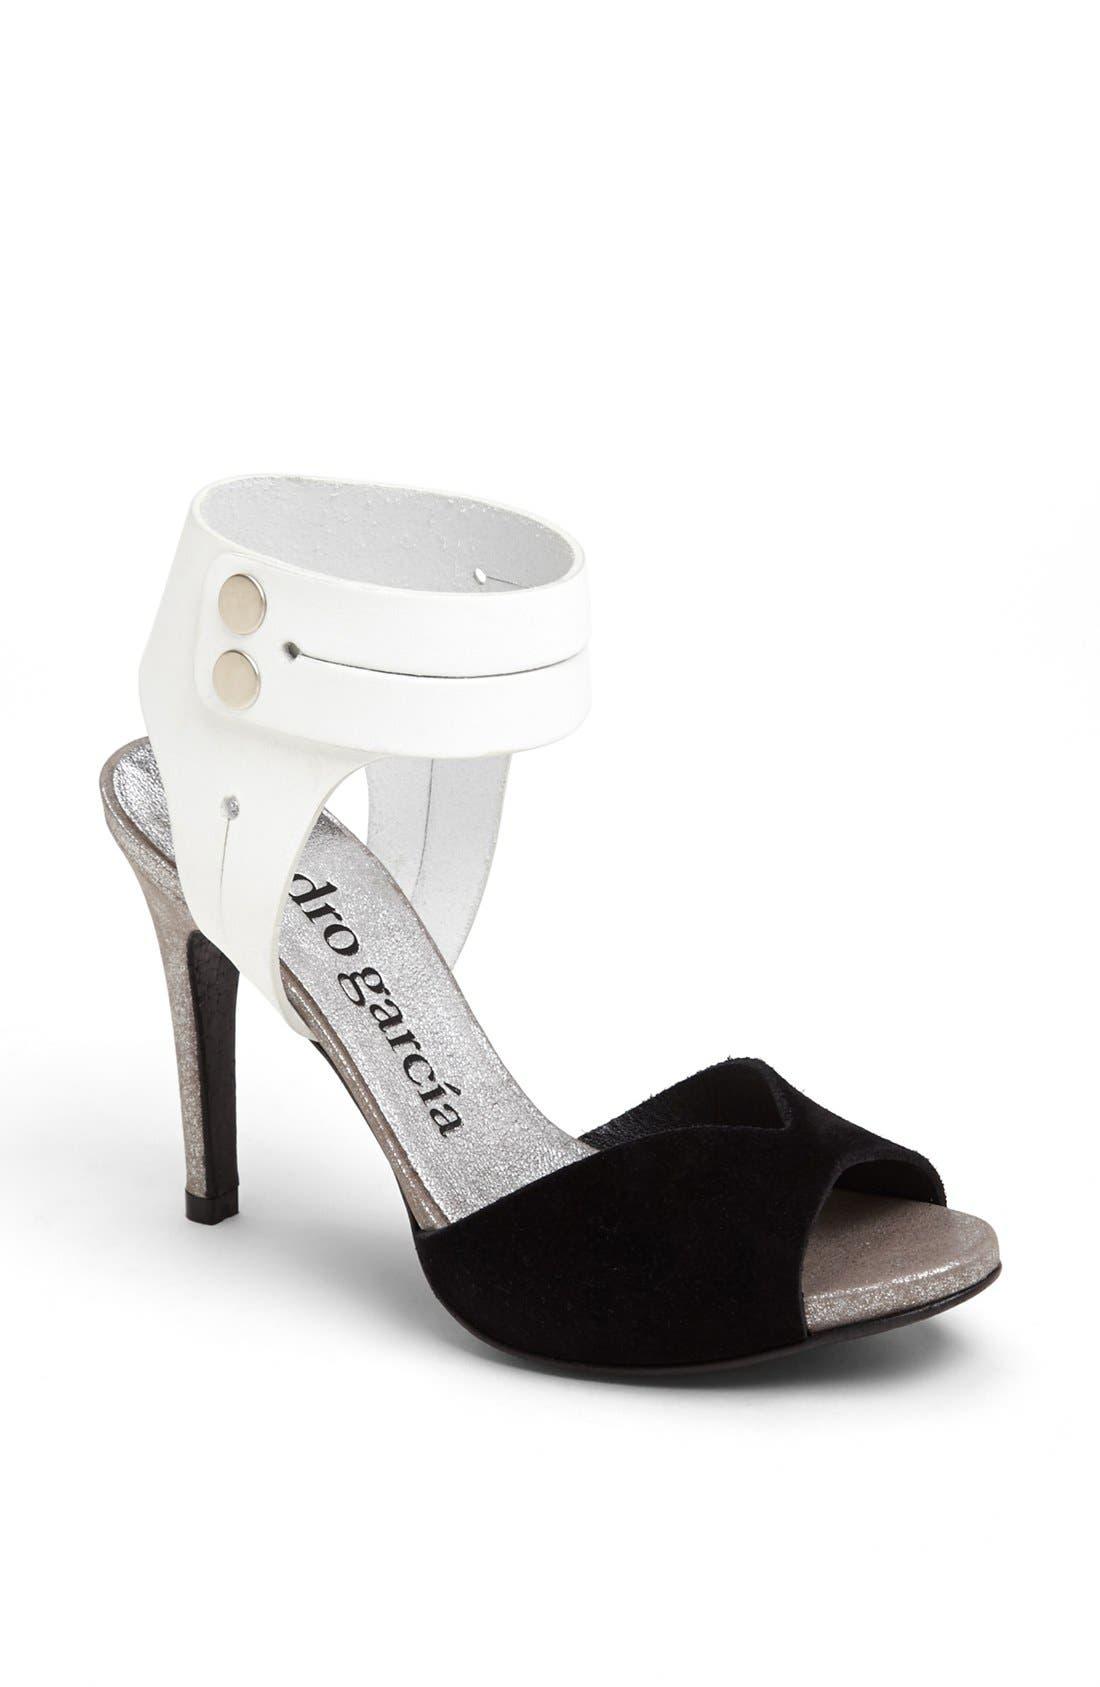 Alternate Image 1 Selected - Pedro Garcia 'Sheryl' Ankle Strap Sandal